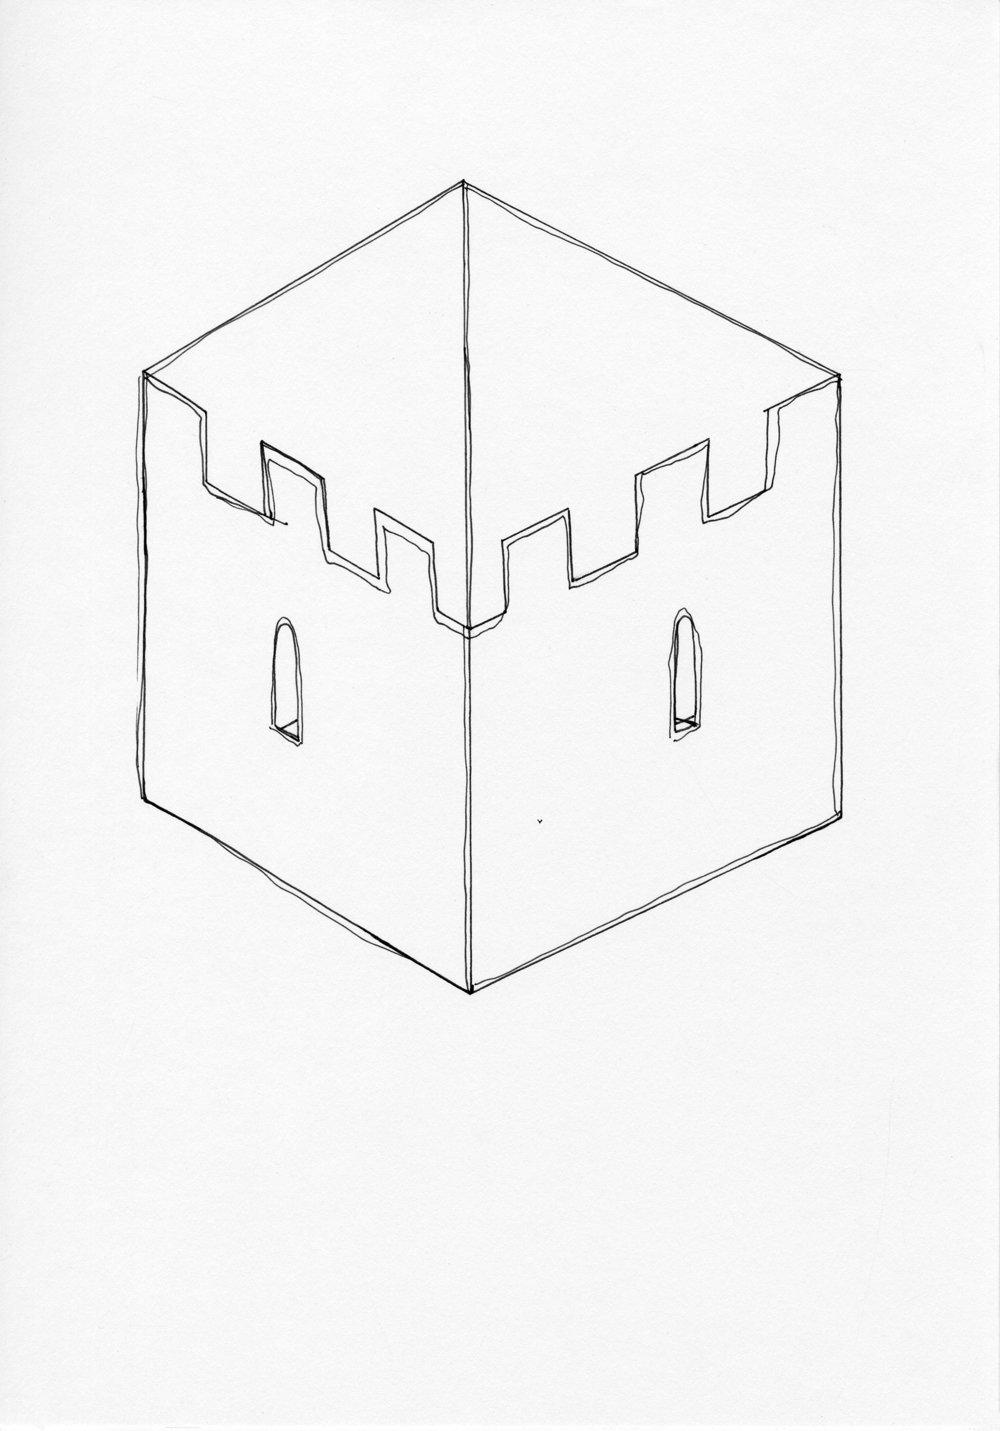 juliet furst SHP sketch 2.jpg